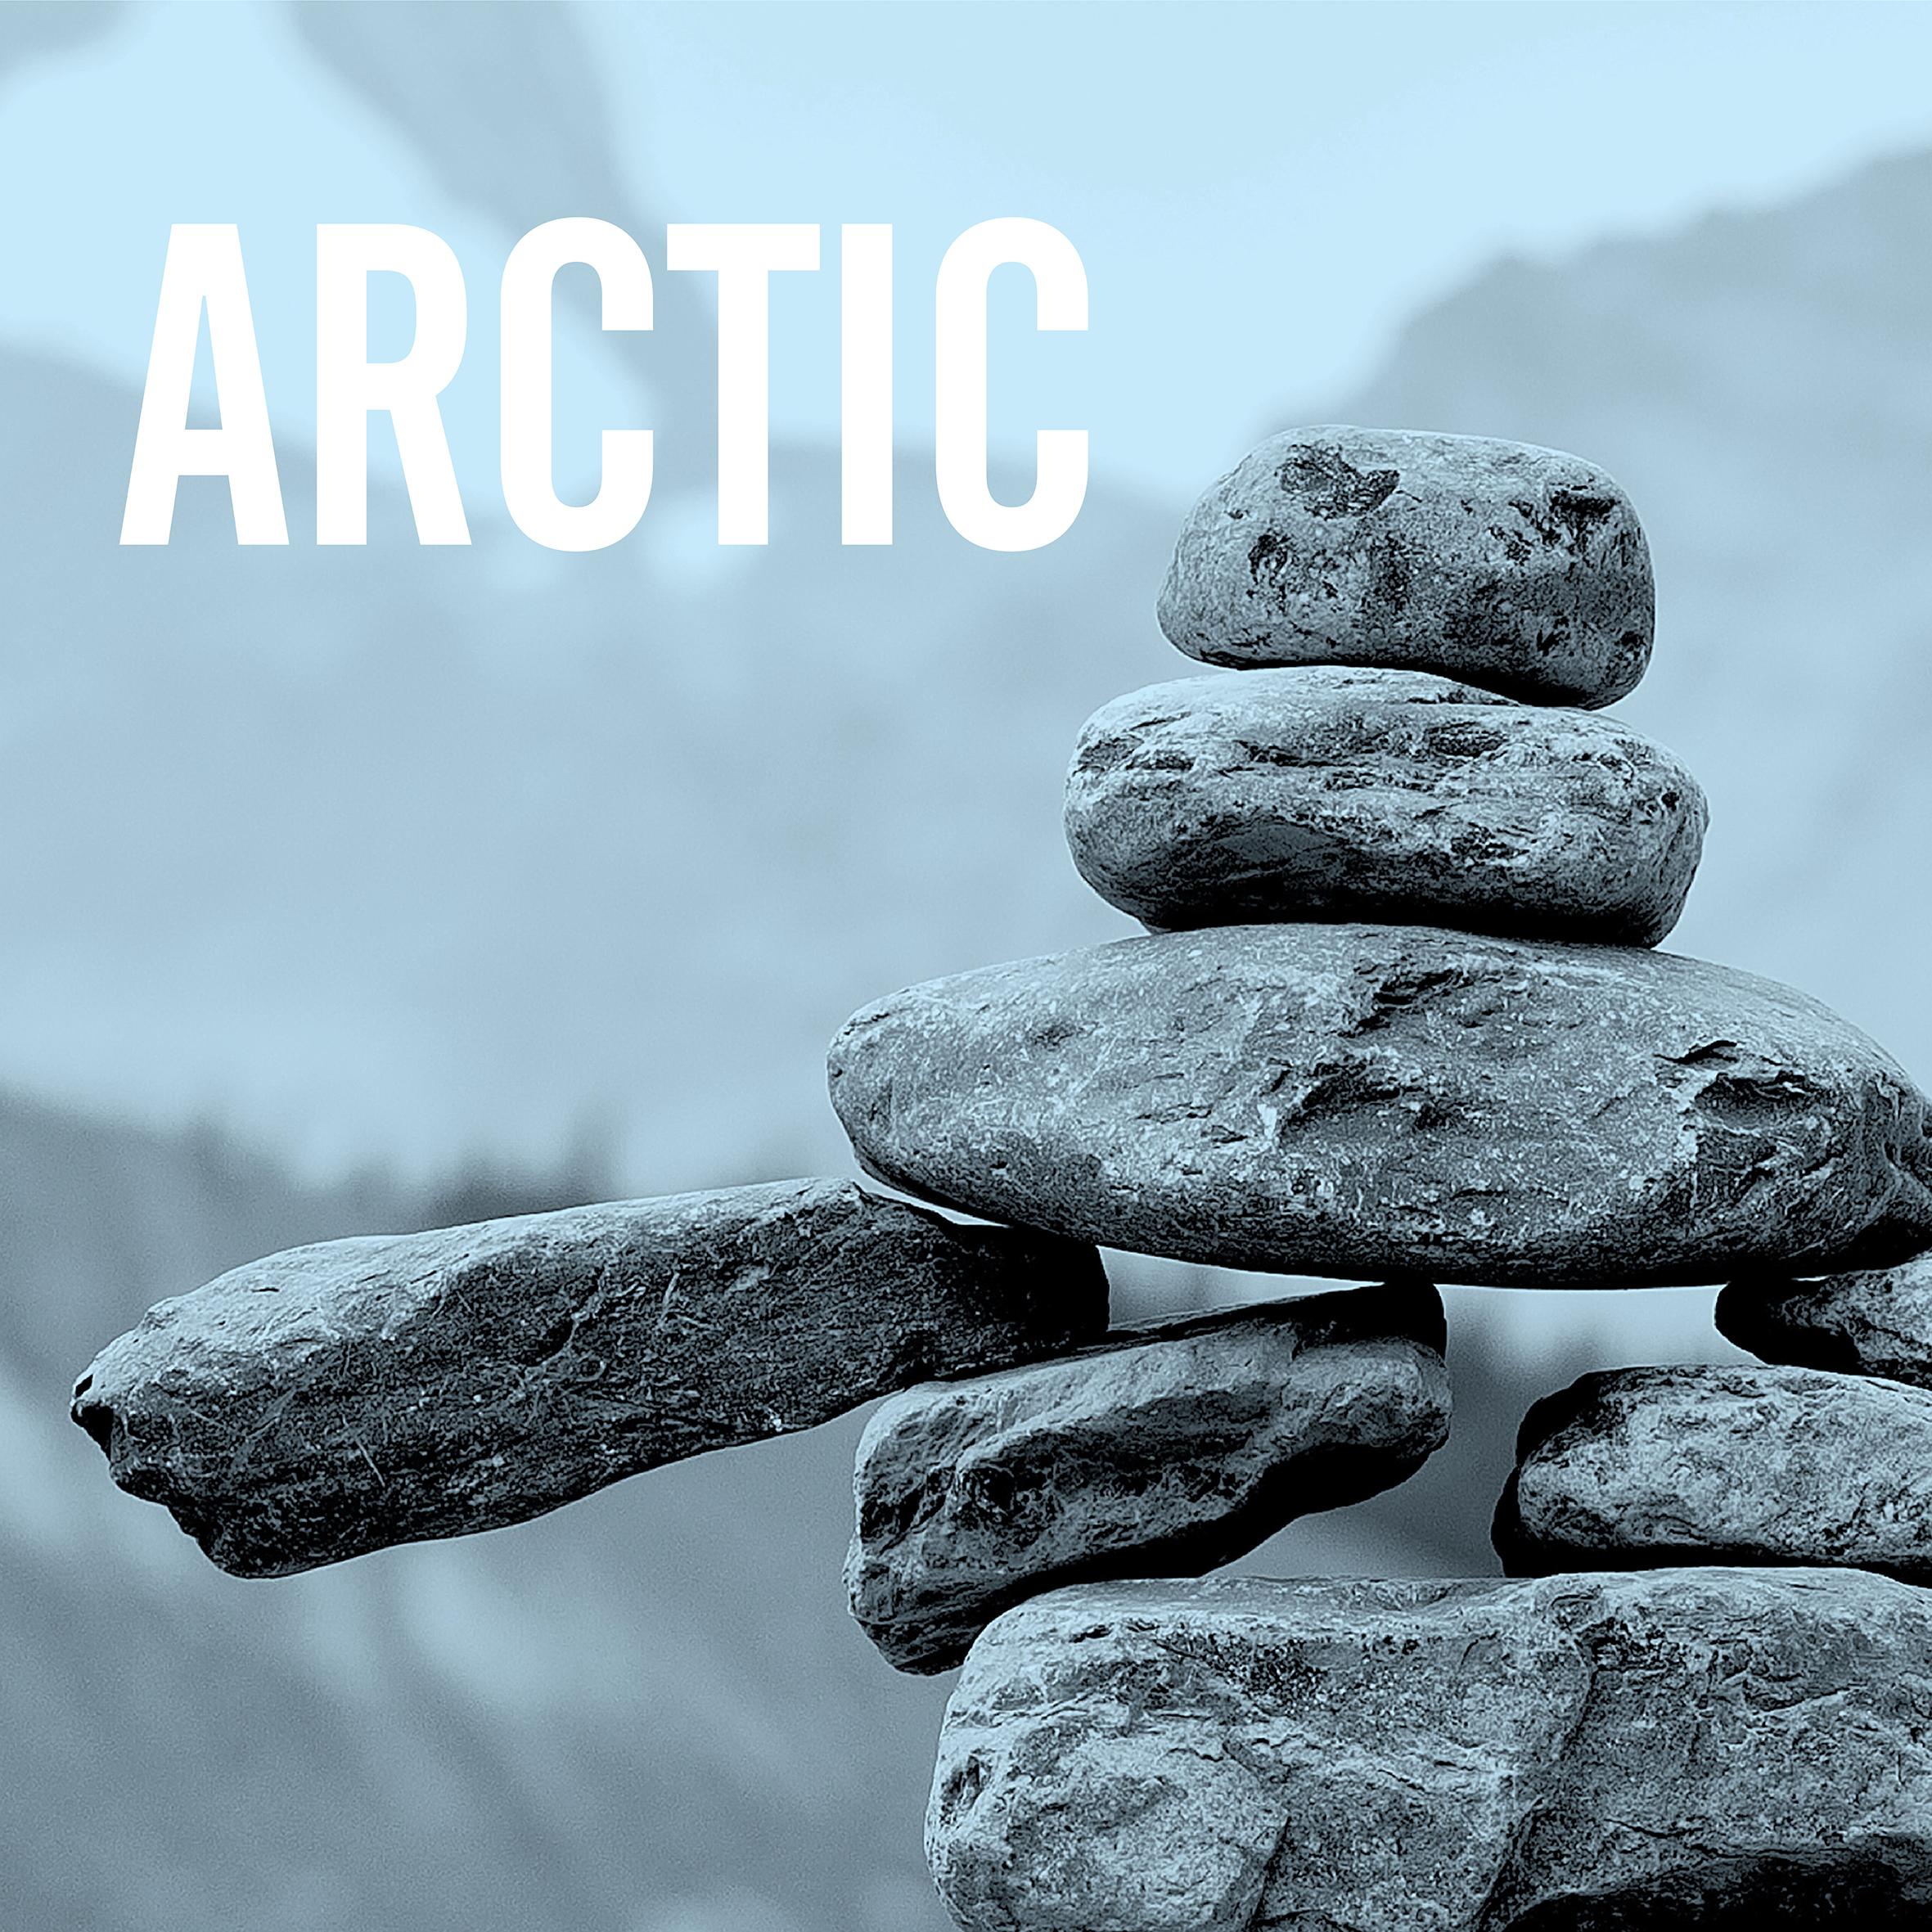 Arctic2.jpg